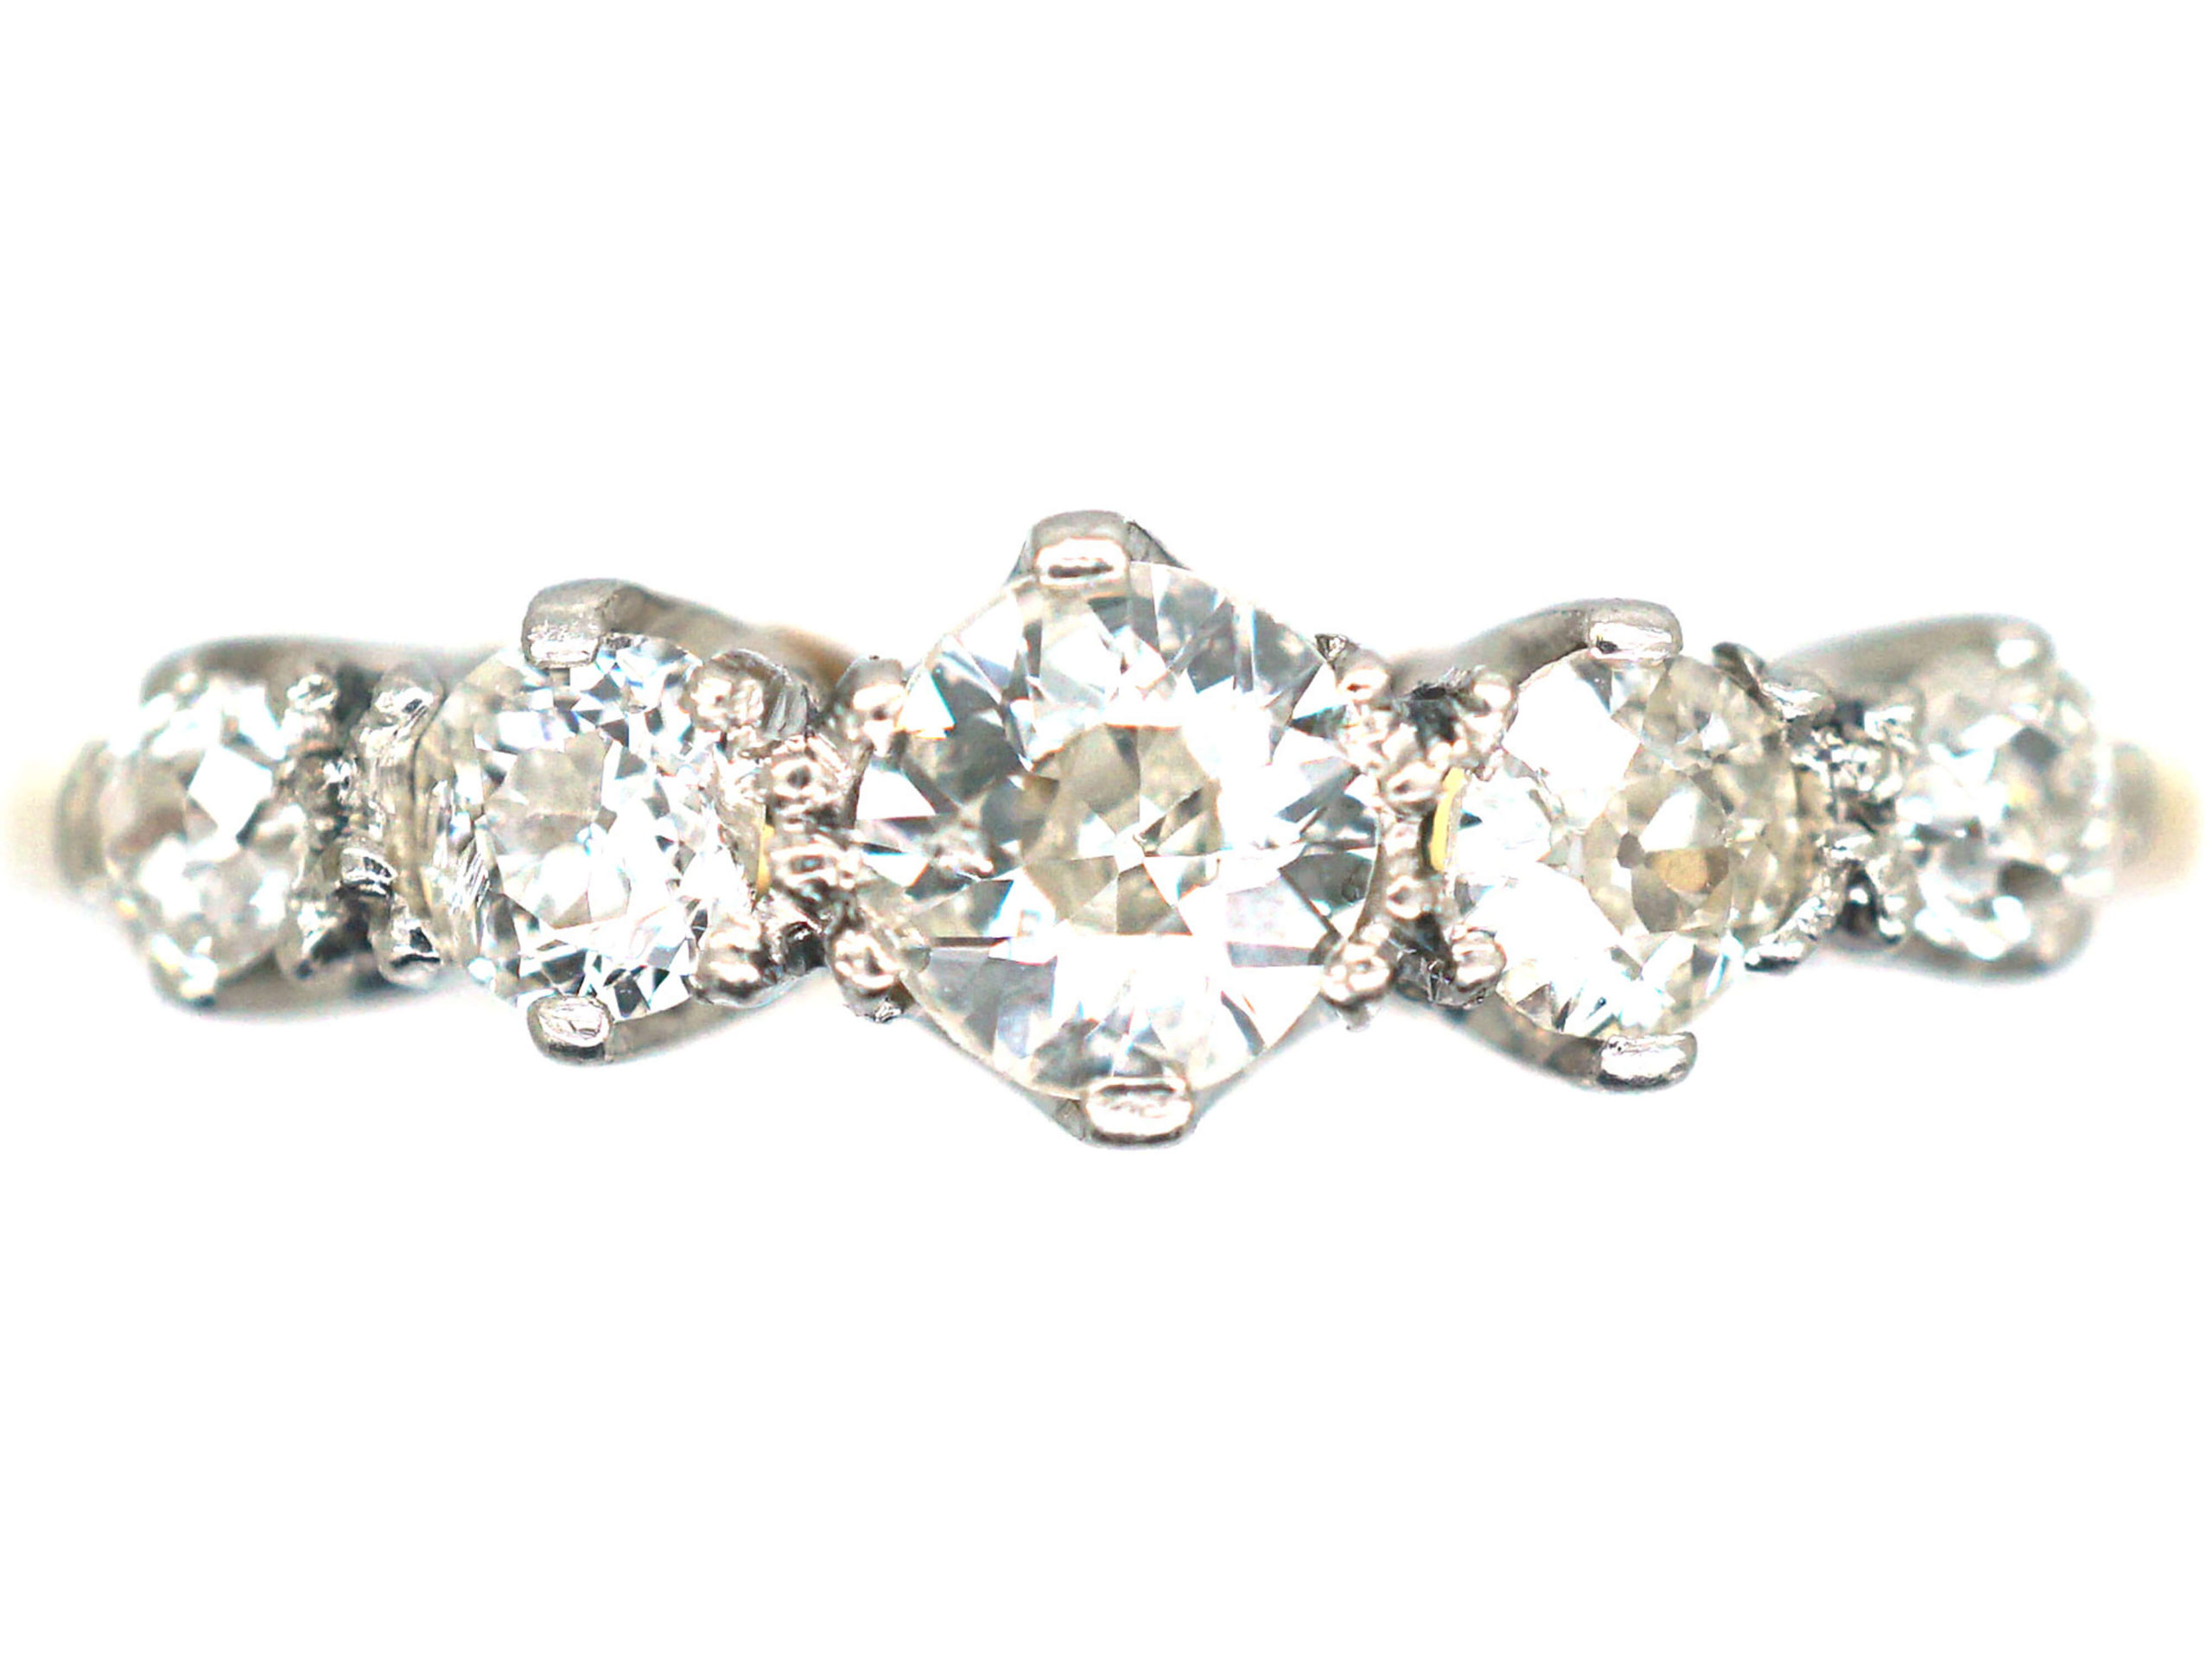 Early 20th Century 18ct Gold & Platinum, Five Stone Diamond Ring